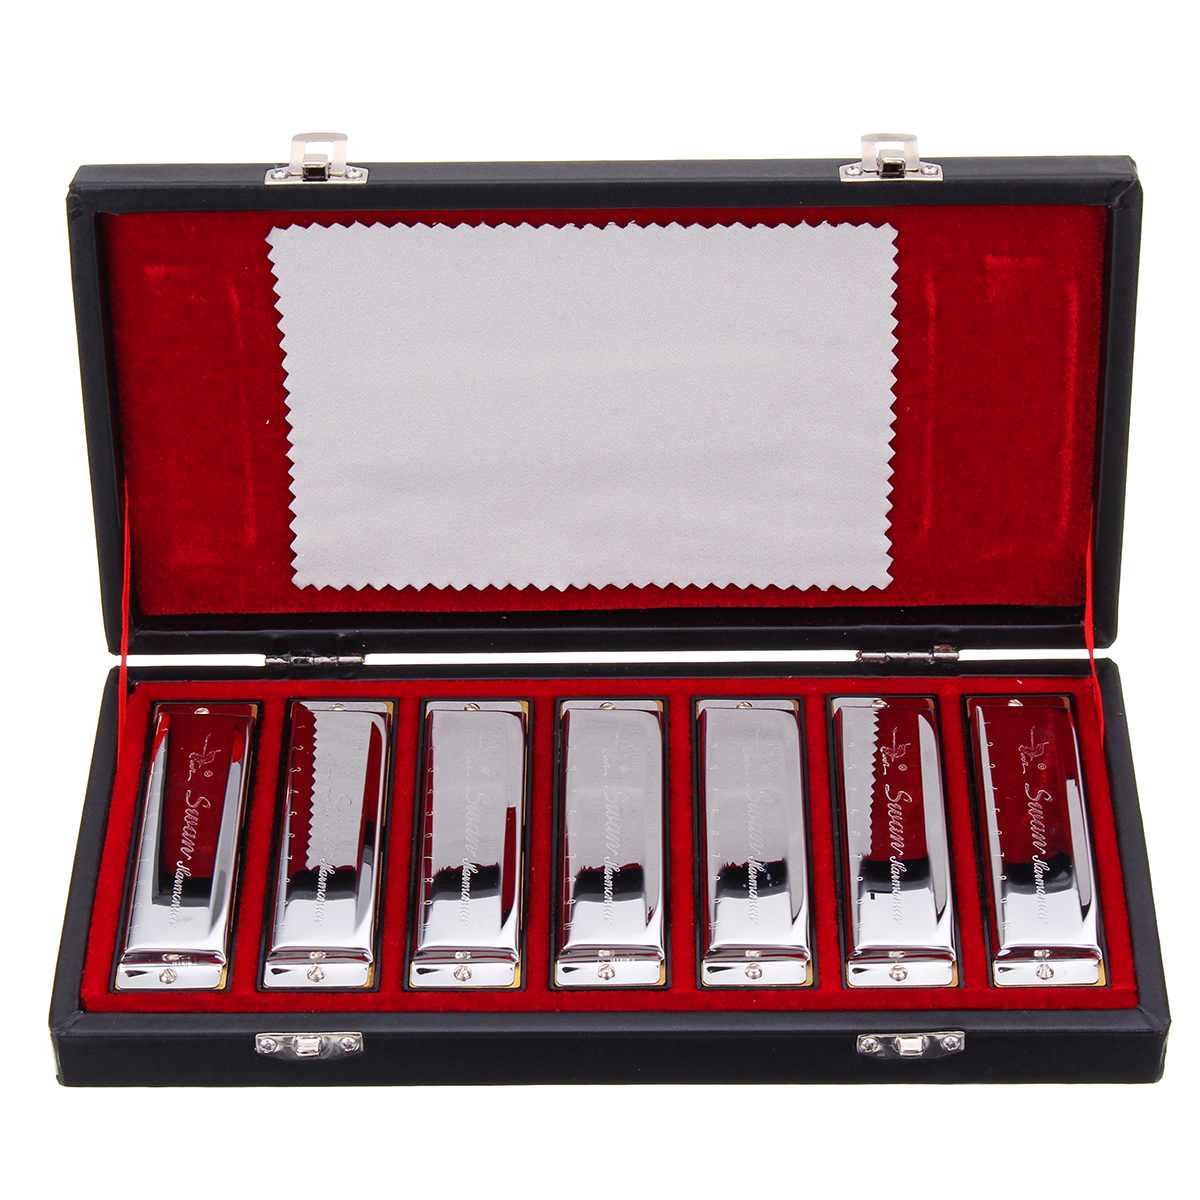 10 Holes Blues Harmonicas Set 7 Keys Performance Haronica ABCDEFG Key Music Musical Instruments Performing Gift Present Box